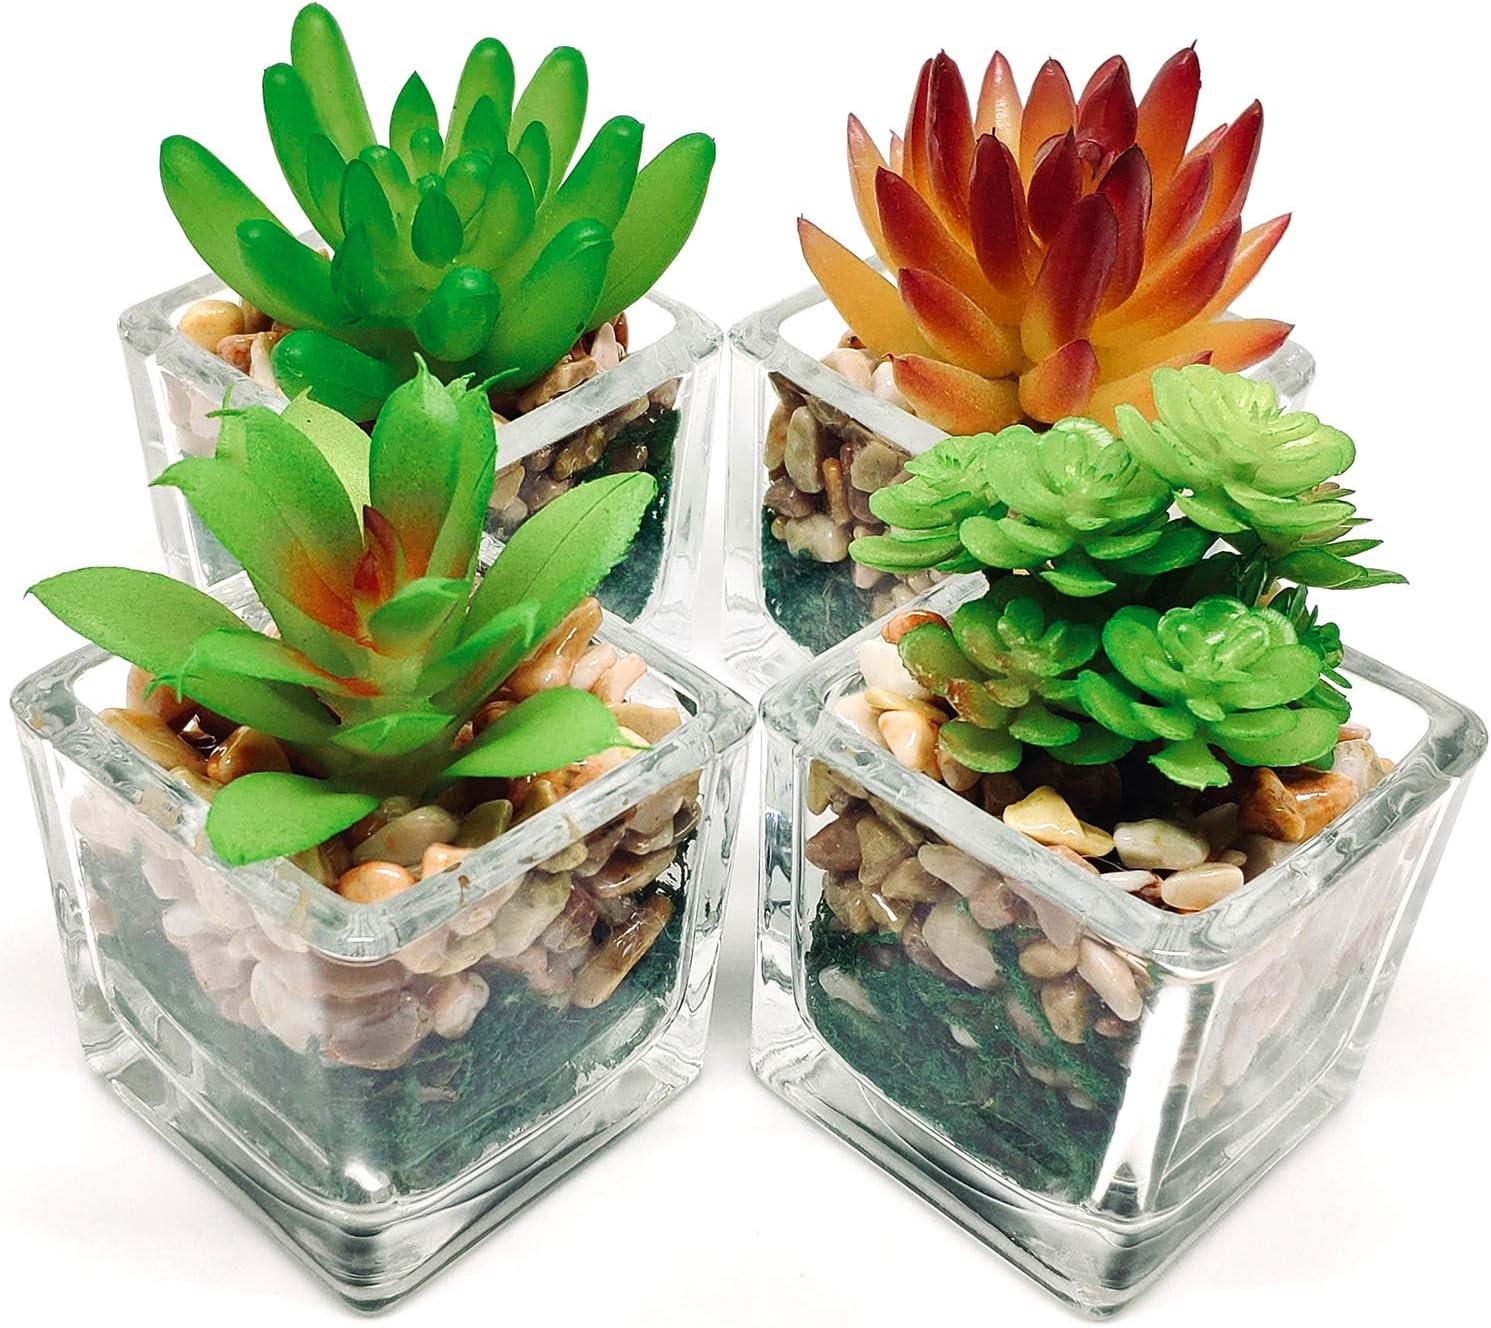 Espoir Living Small Artificial Succulents in Glass Cubes | 4 Set | Assorted Realistic Faux Plants